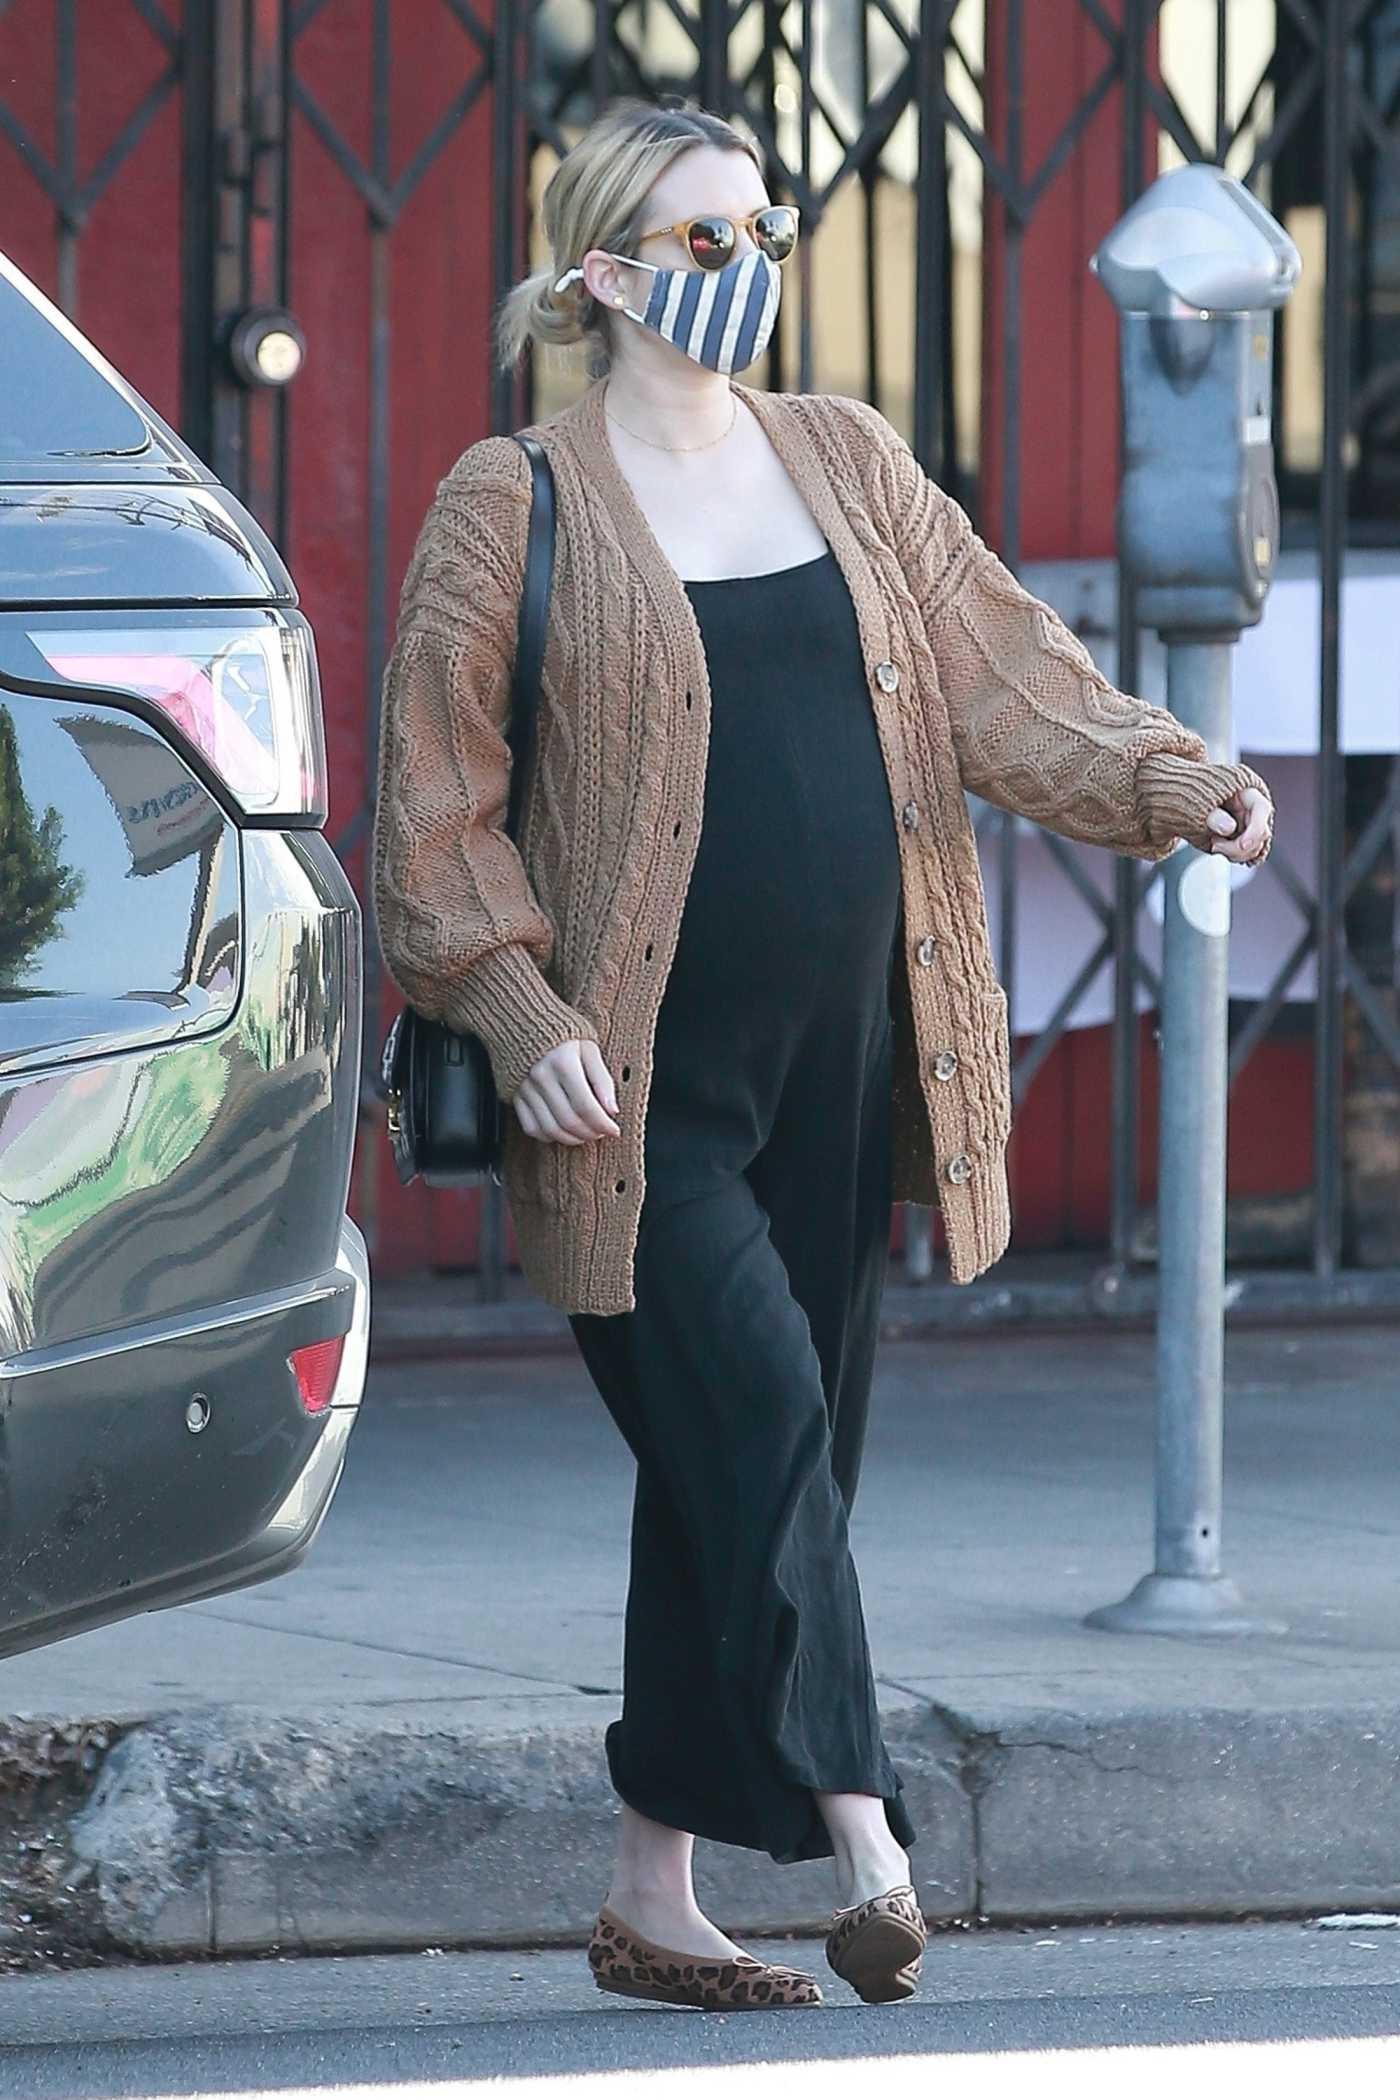 Emma Roberts in a Tan Cardigan Goes for a Solo Coffee Run in Los Feliz 12/09/2020